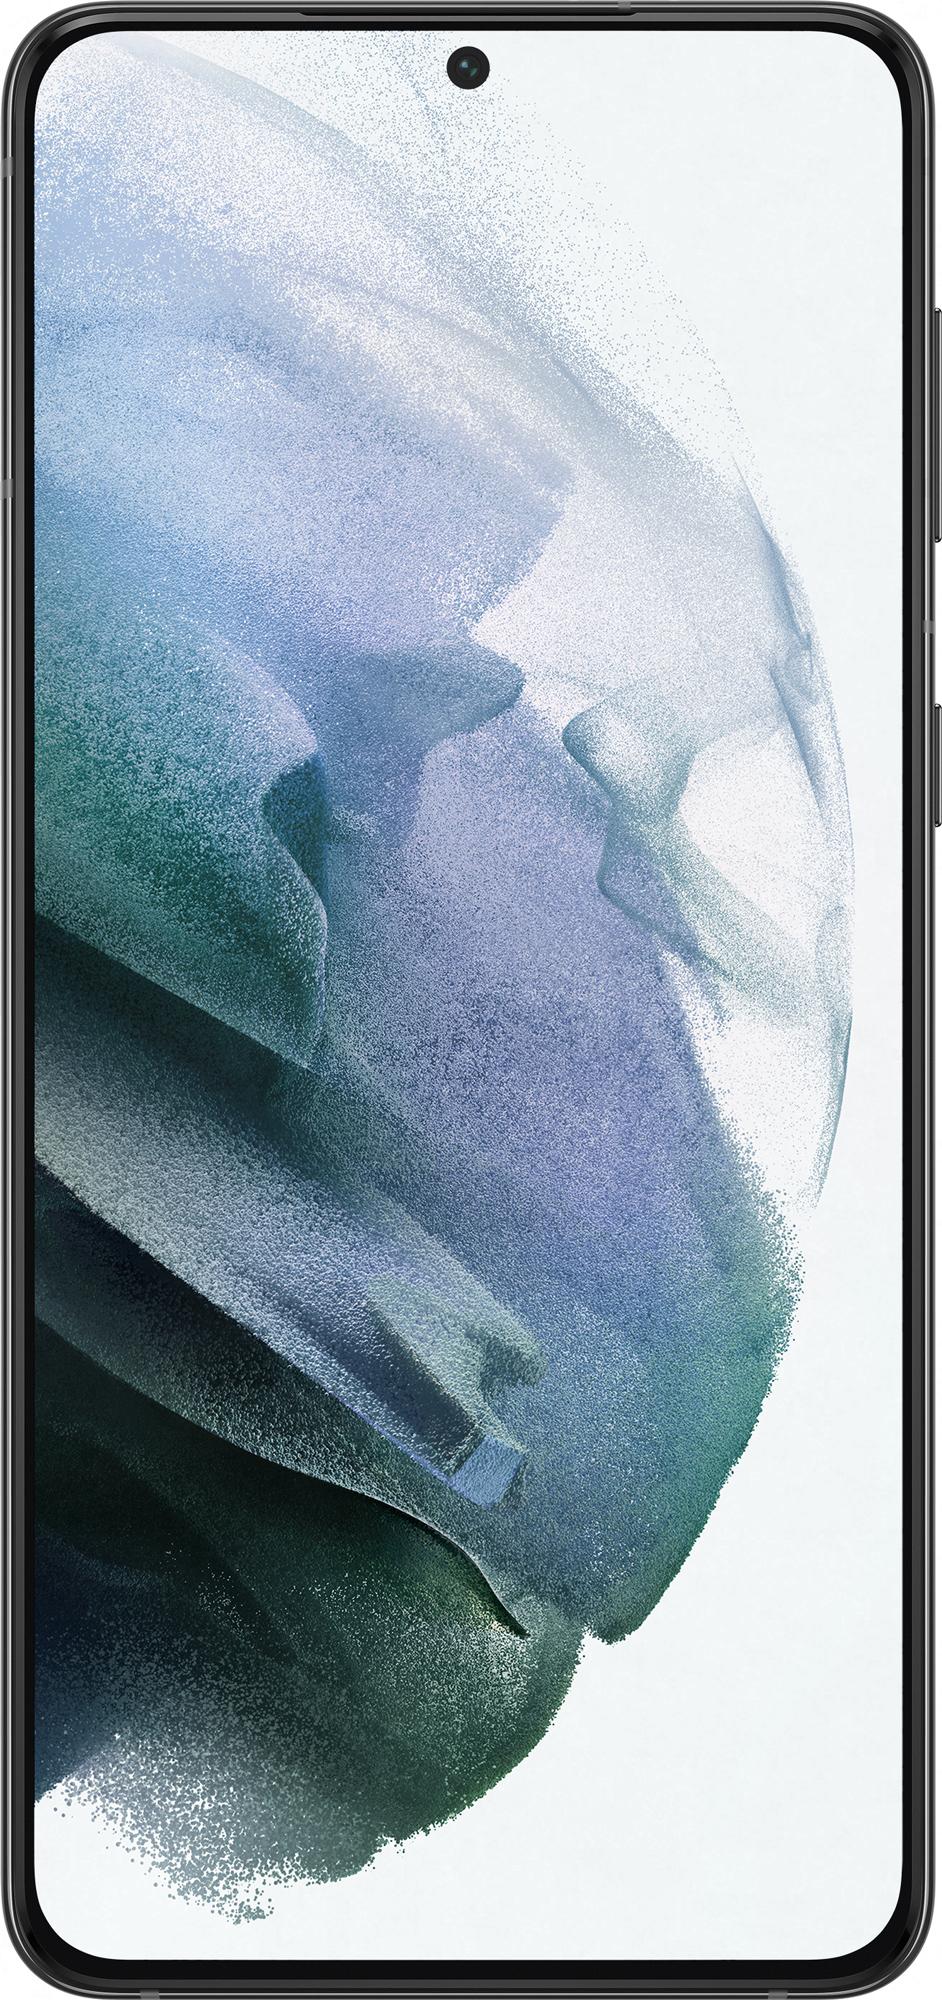 Смартфон Samsung Galaxy S21 Plus 8/256GB Phantom Black (SM-G996BZKGSEK)